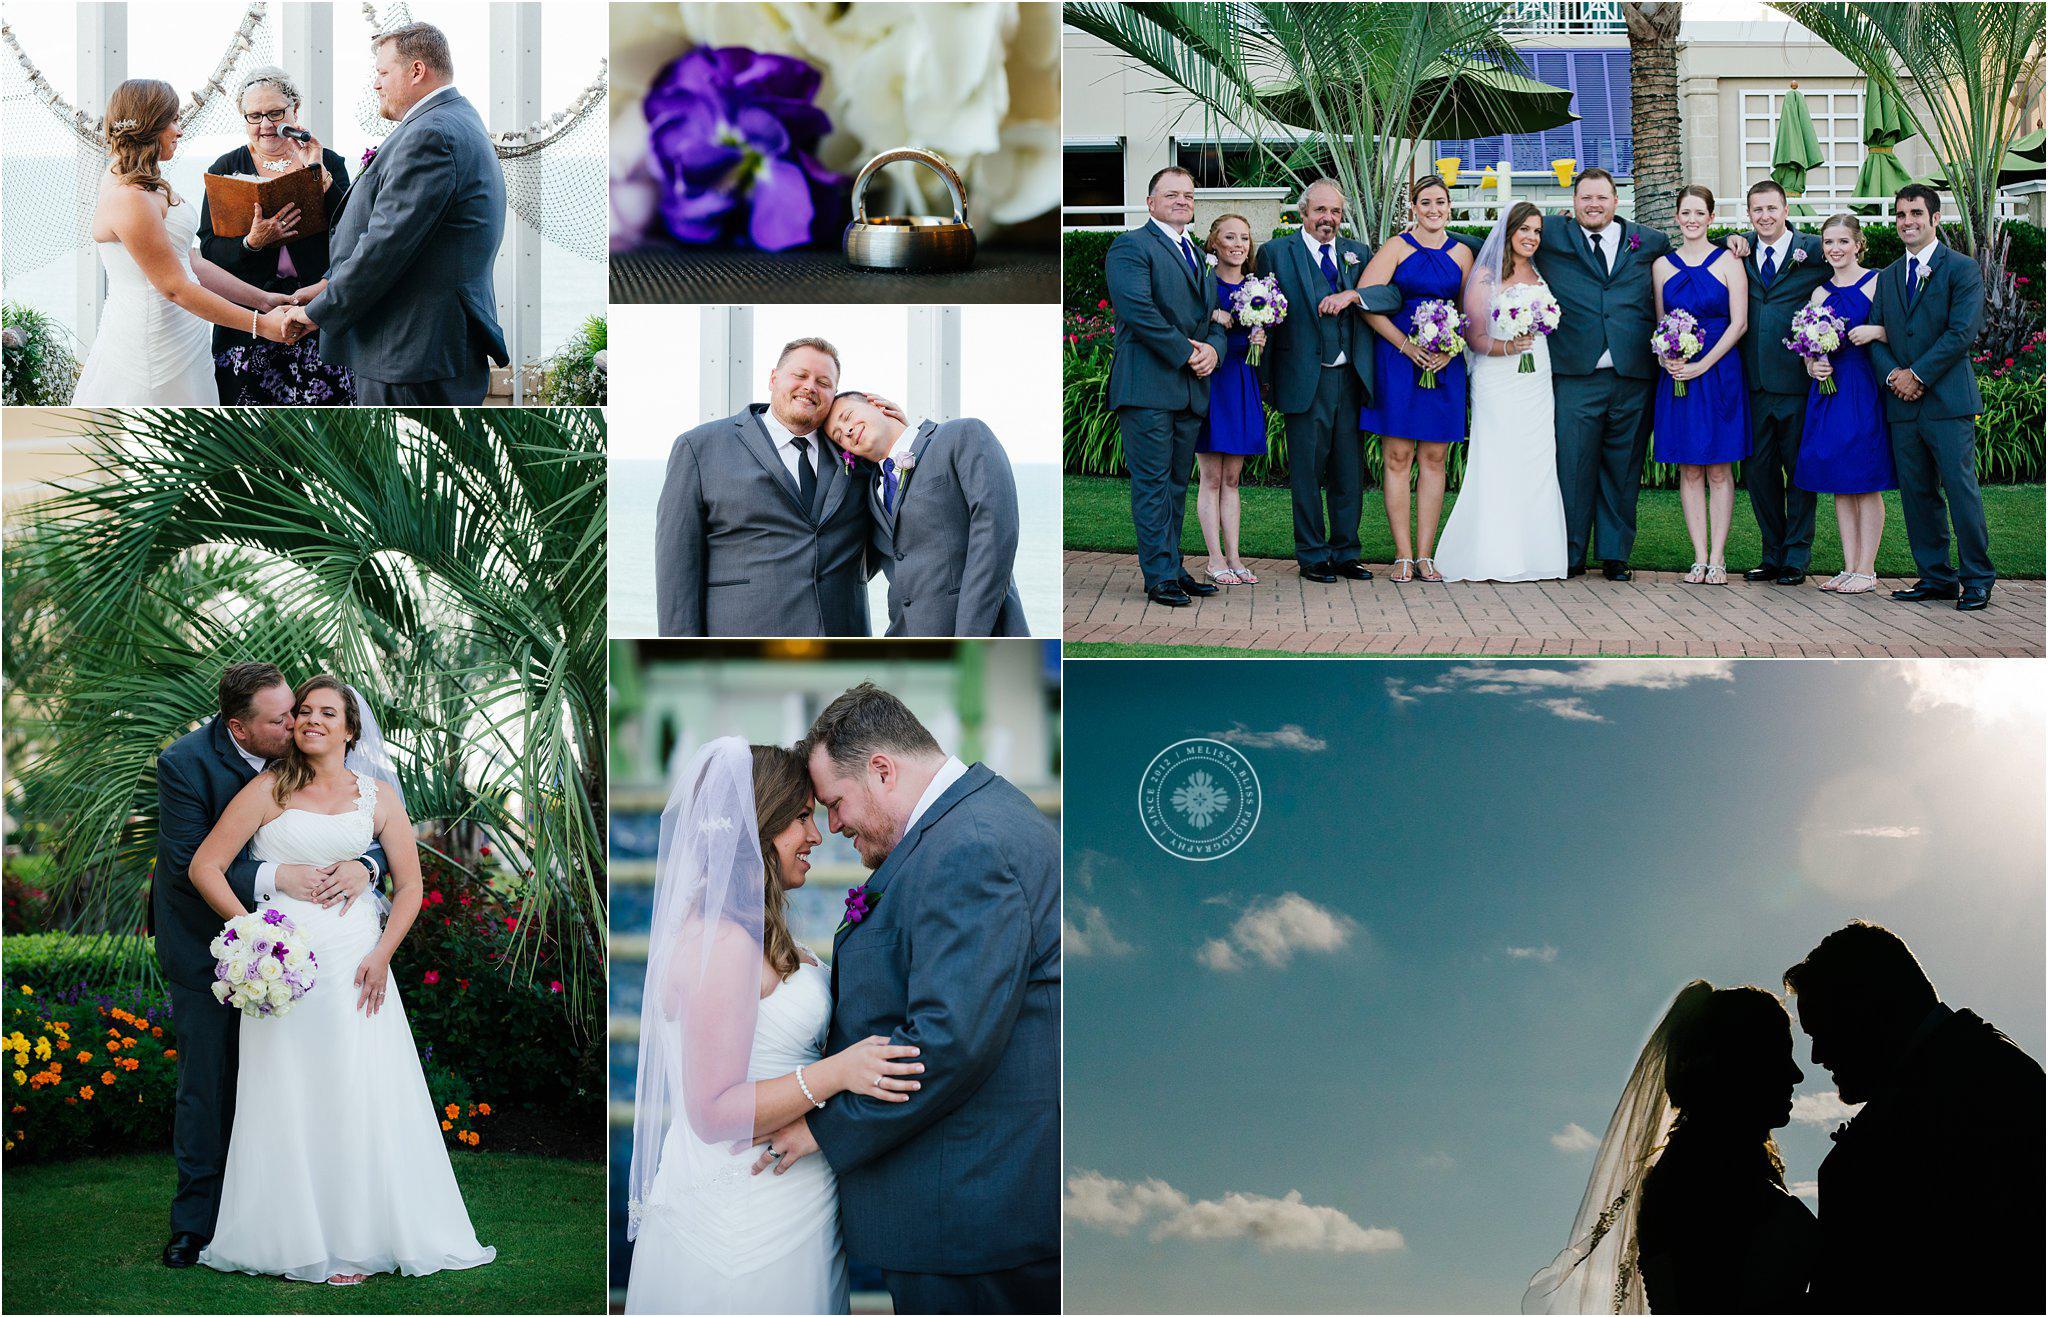 virginia-beach-oceanfront-wedding-melissa-bliss-photography-wedding-photographer-norfolk-portsmouth-sandbridge-williamsburg-va